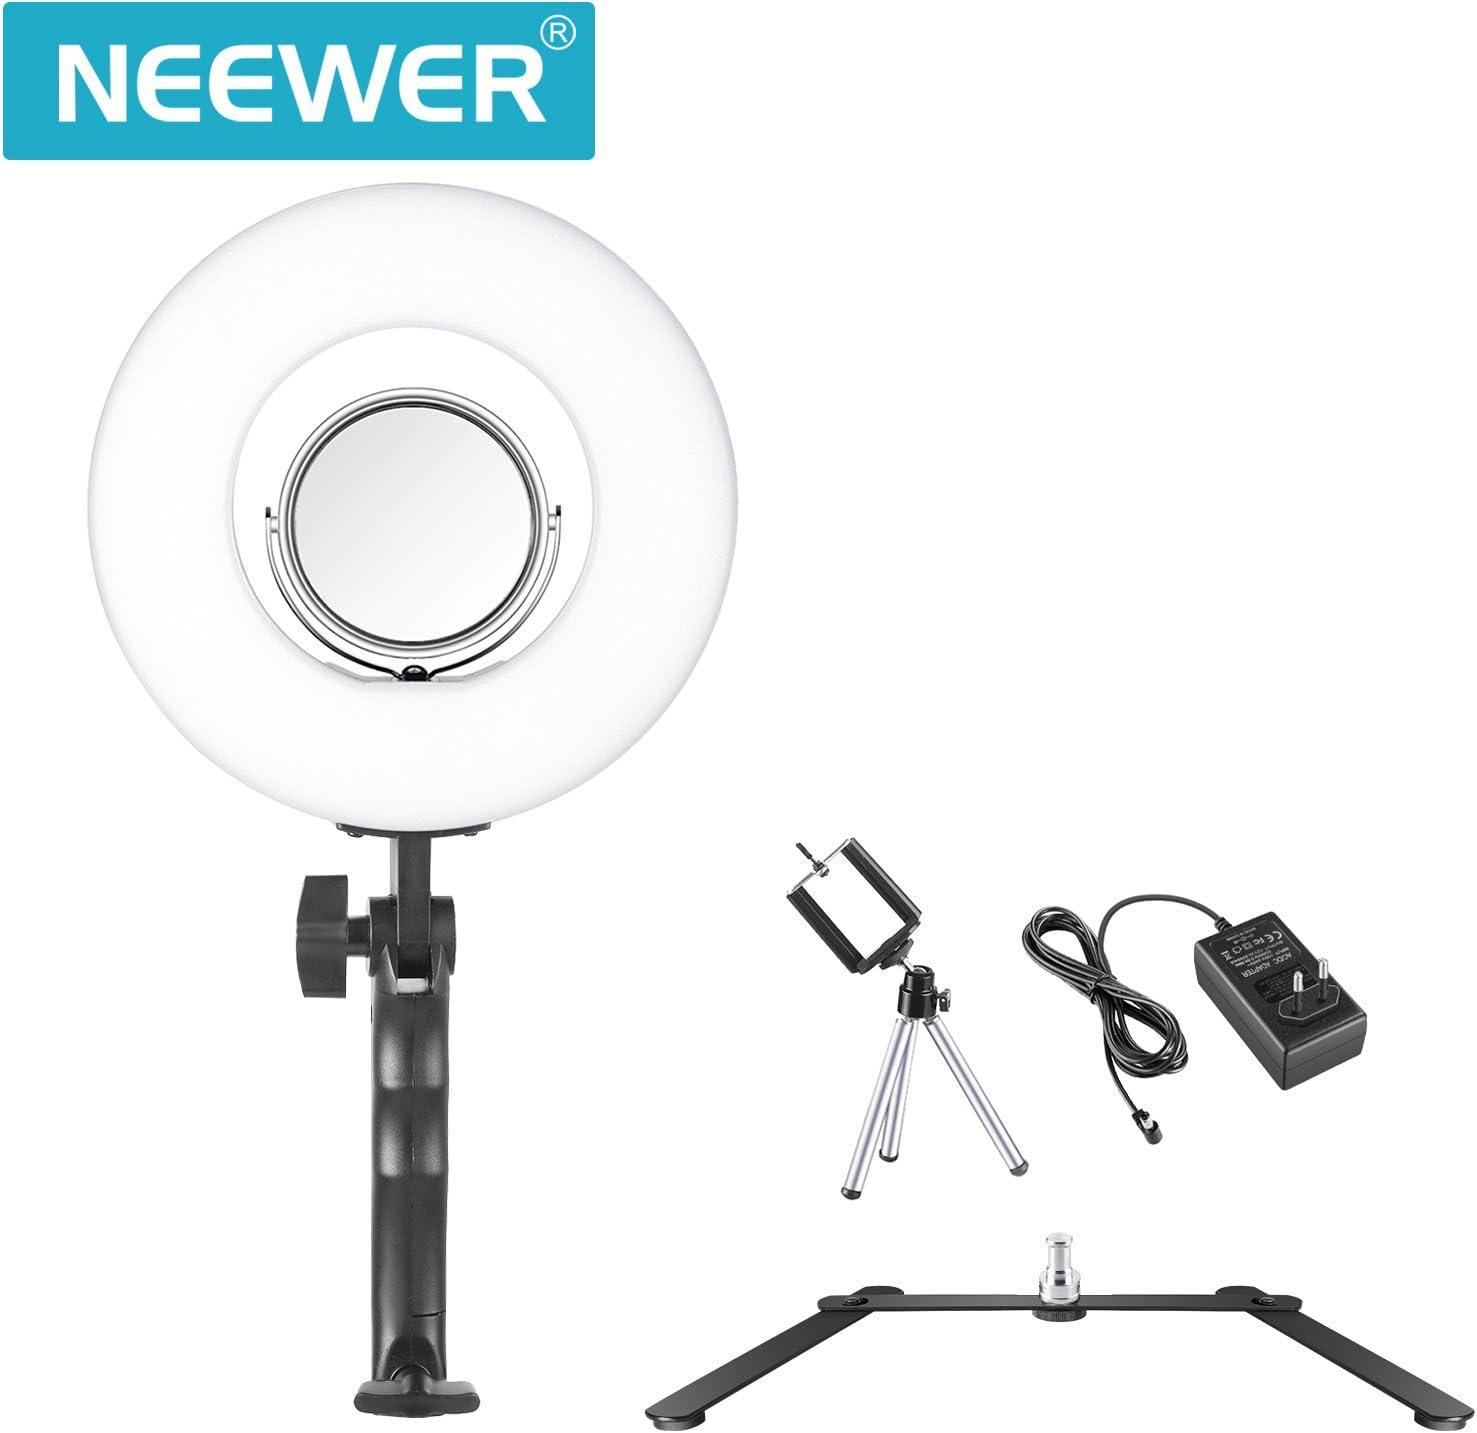 Neewer Luz anular LED SMD Regulable Bicolor Brazo Flexible Base Metal Difusor Soporte Clip para Smartphone filtros de Colores para grabaci/ón de V/ídeo de Plug US//UE